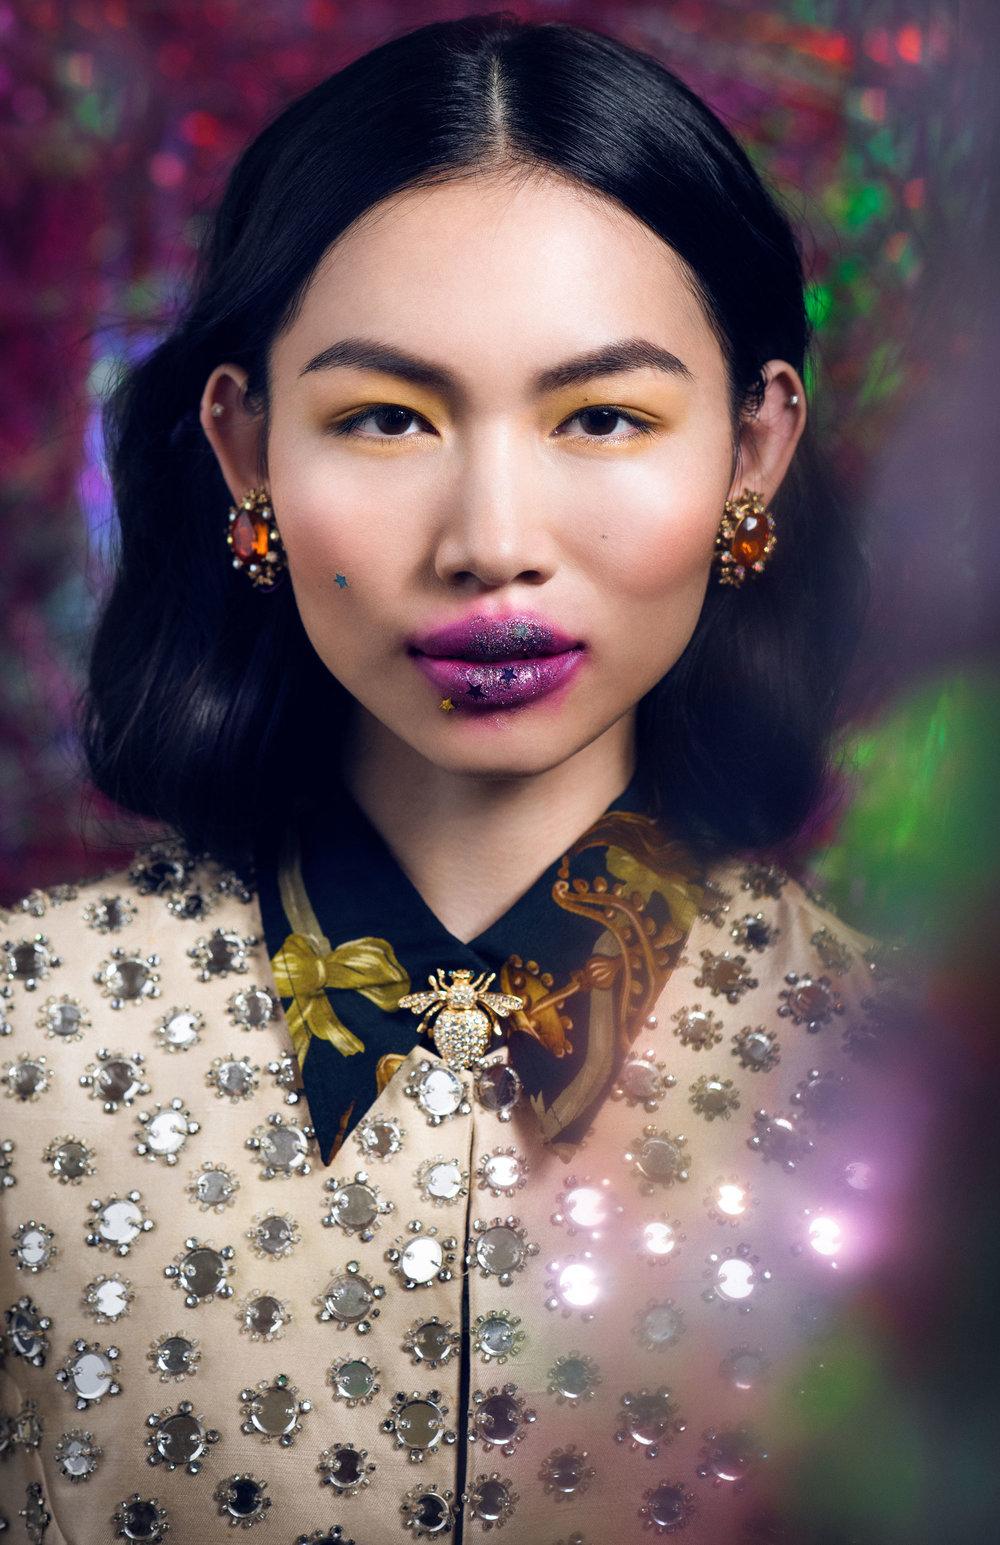 Augusta_Sagnelli_Glitter_Beauty_Editorial-5.jpg